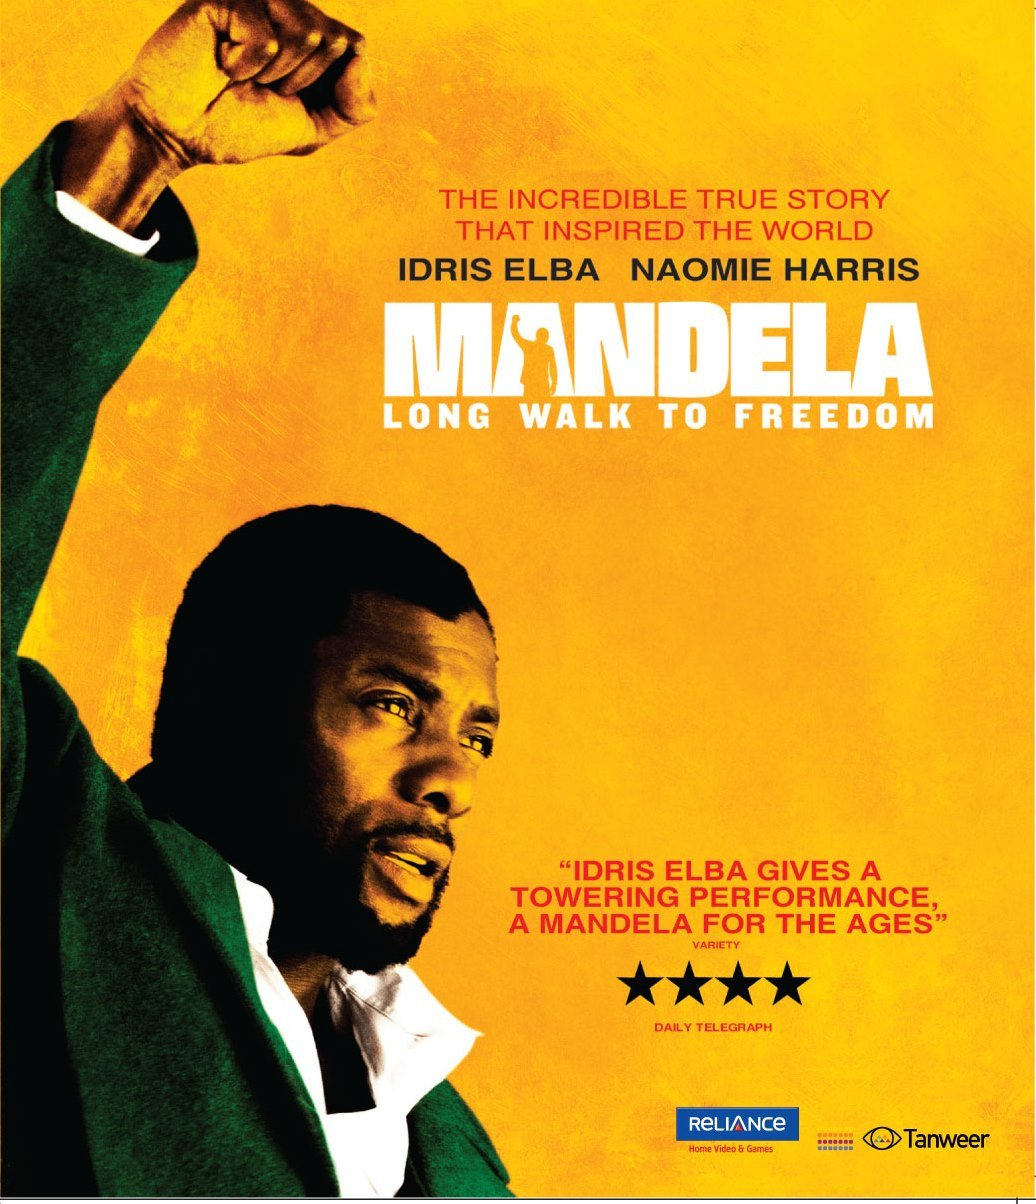 mandela long walk to freedom full movie download in hindi